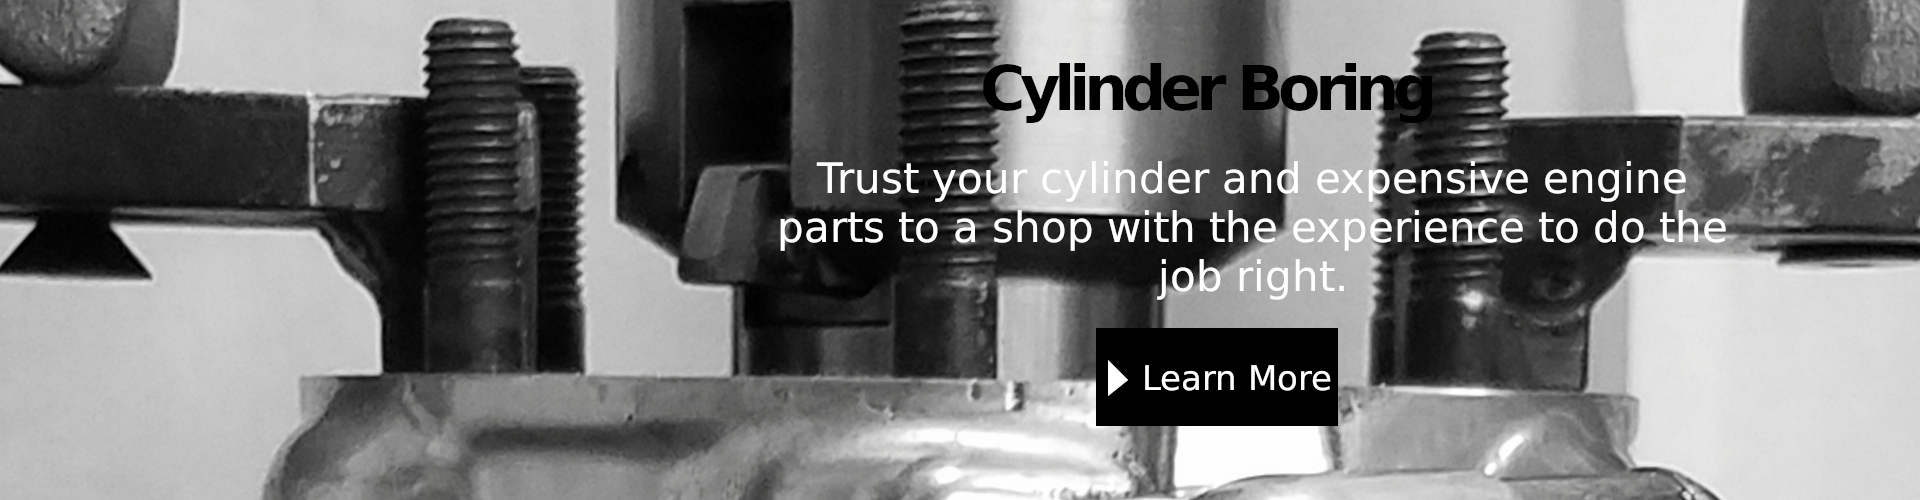 Cylinder boring